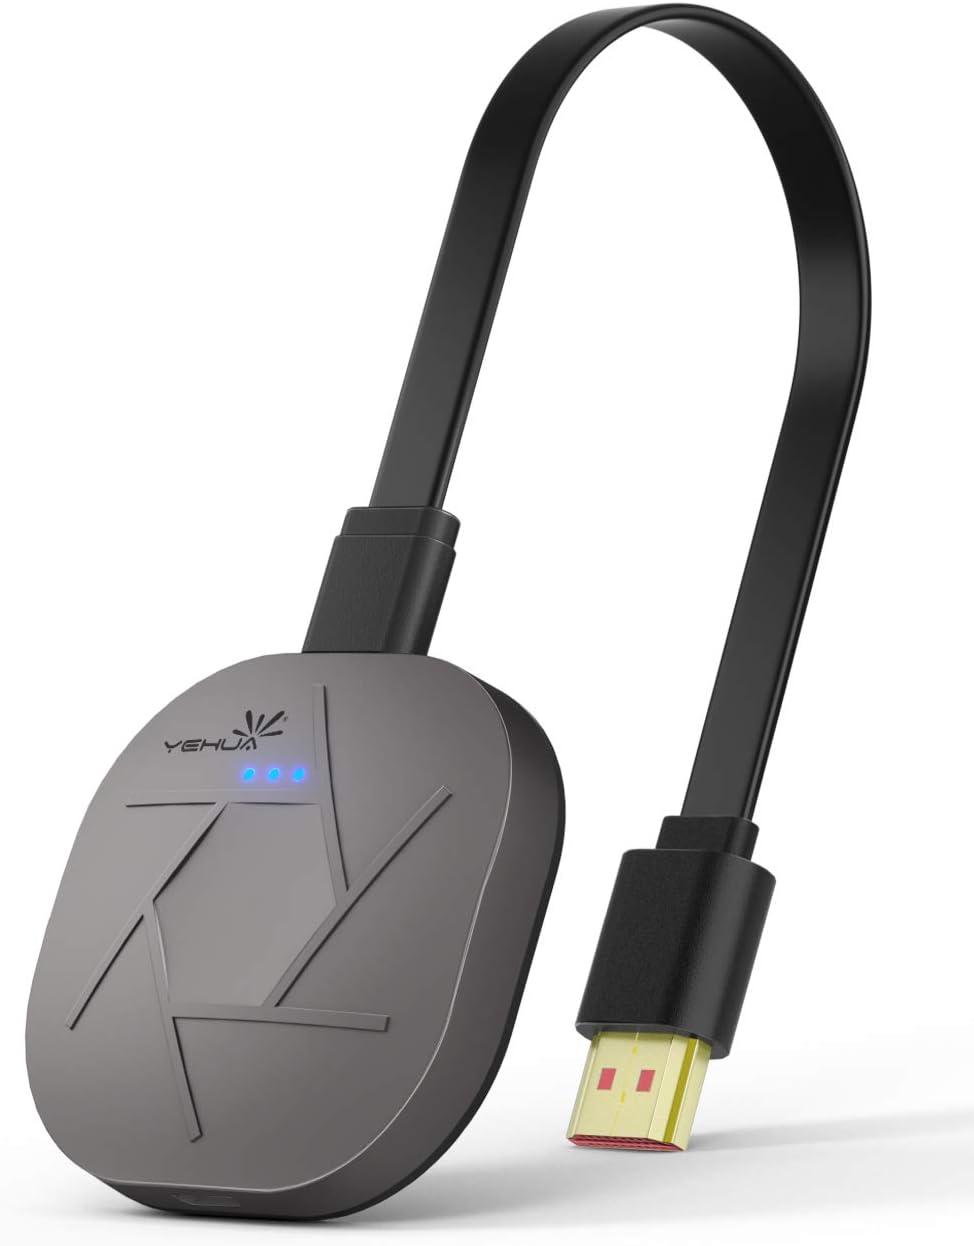 YEHUA 5G/2.4G Miracast HDMI Dongle,Receptor de Pantalla WiFi Soporte Airplay Miracast DLNA para Android/iOS/Windows/MacOS